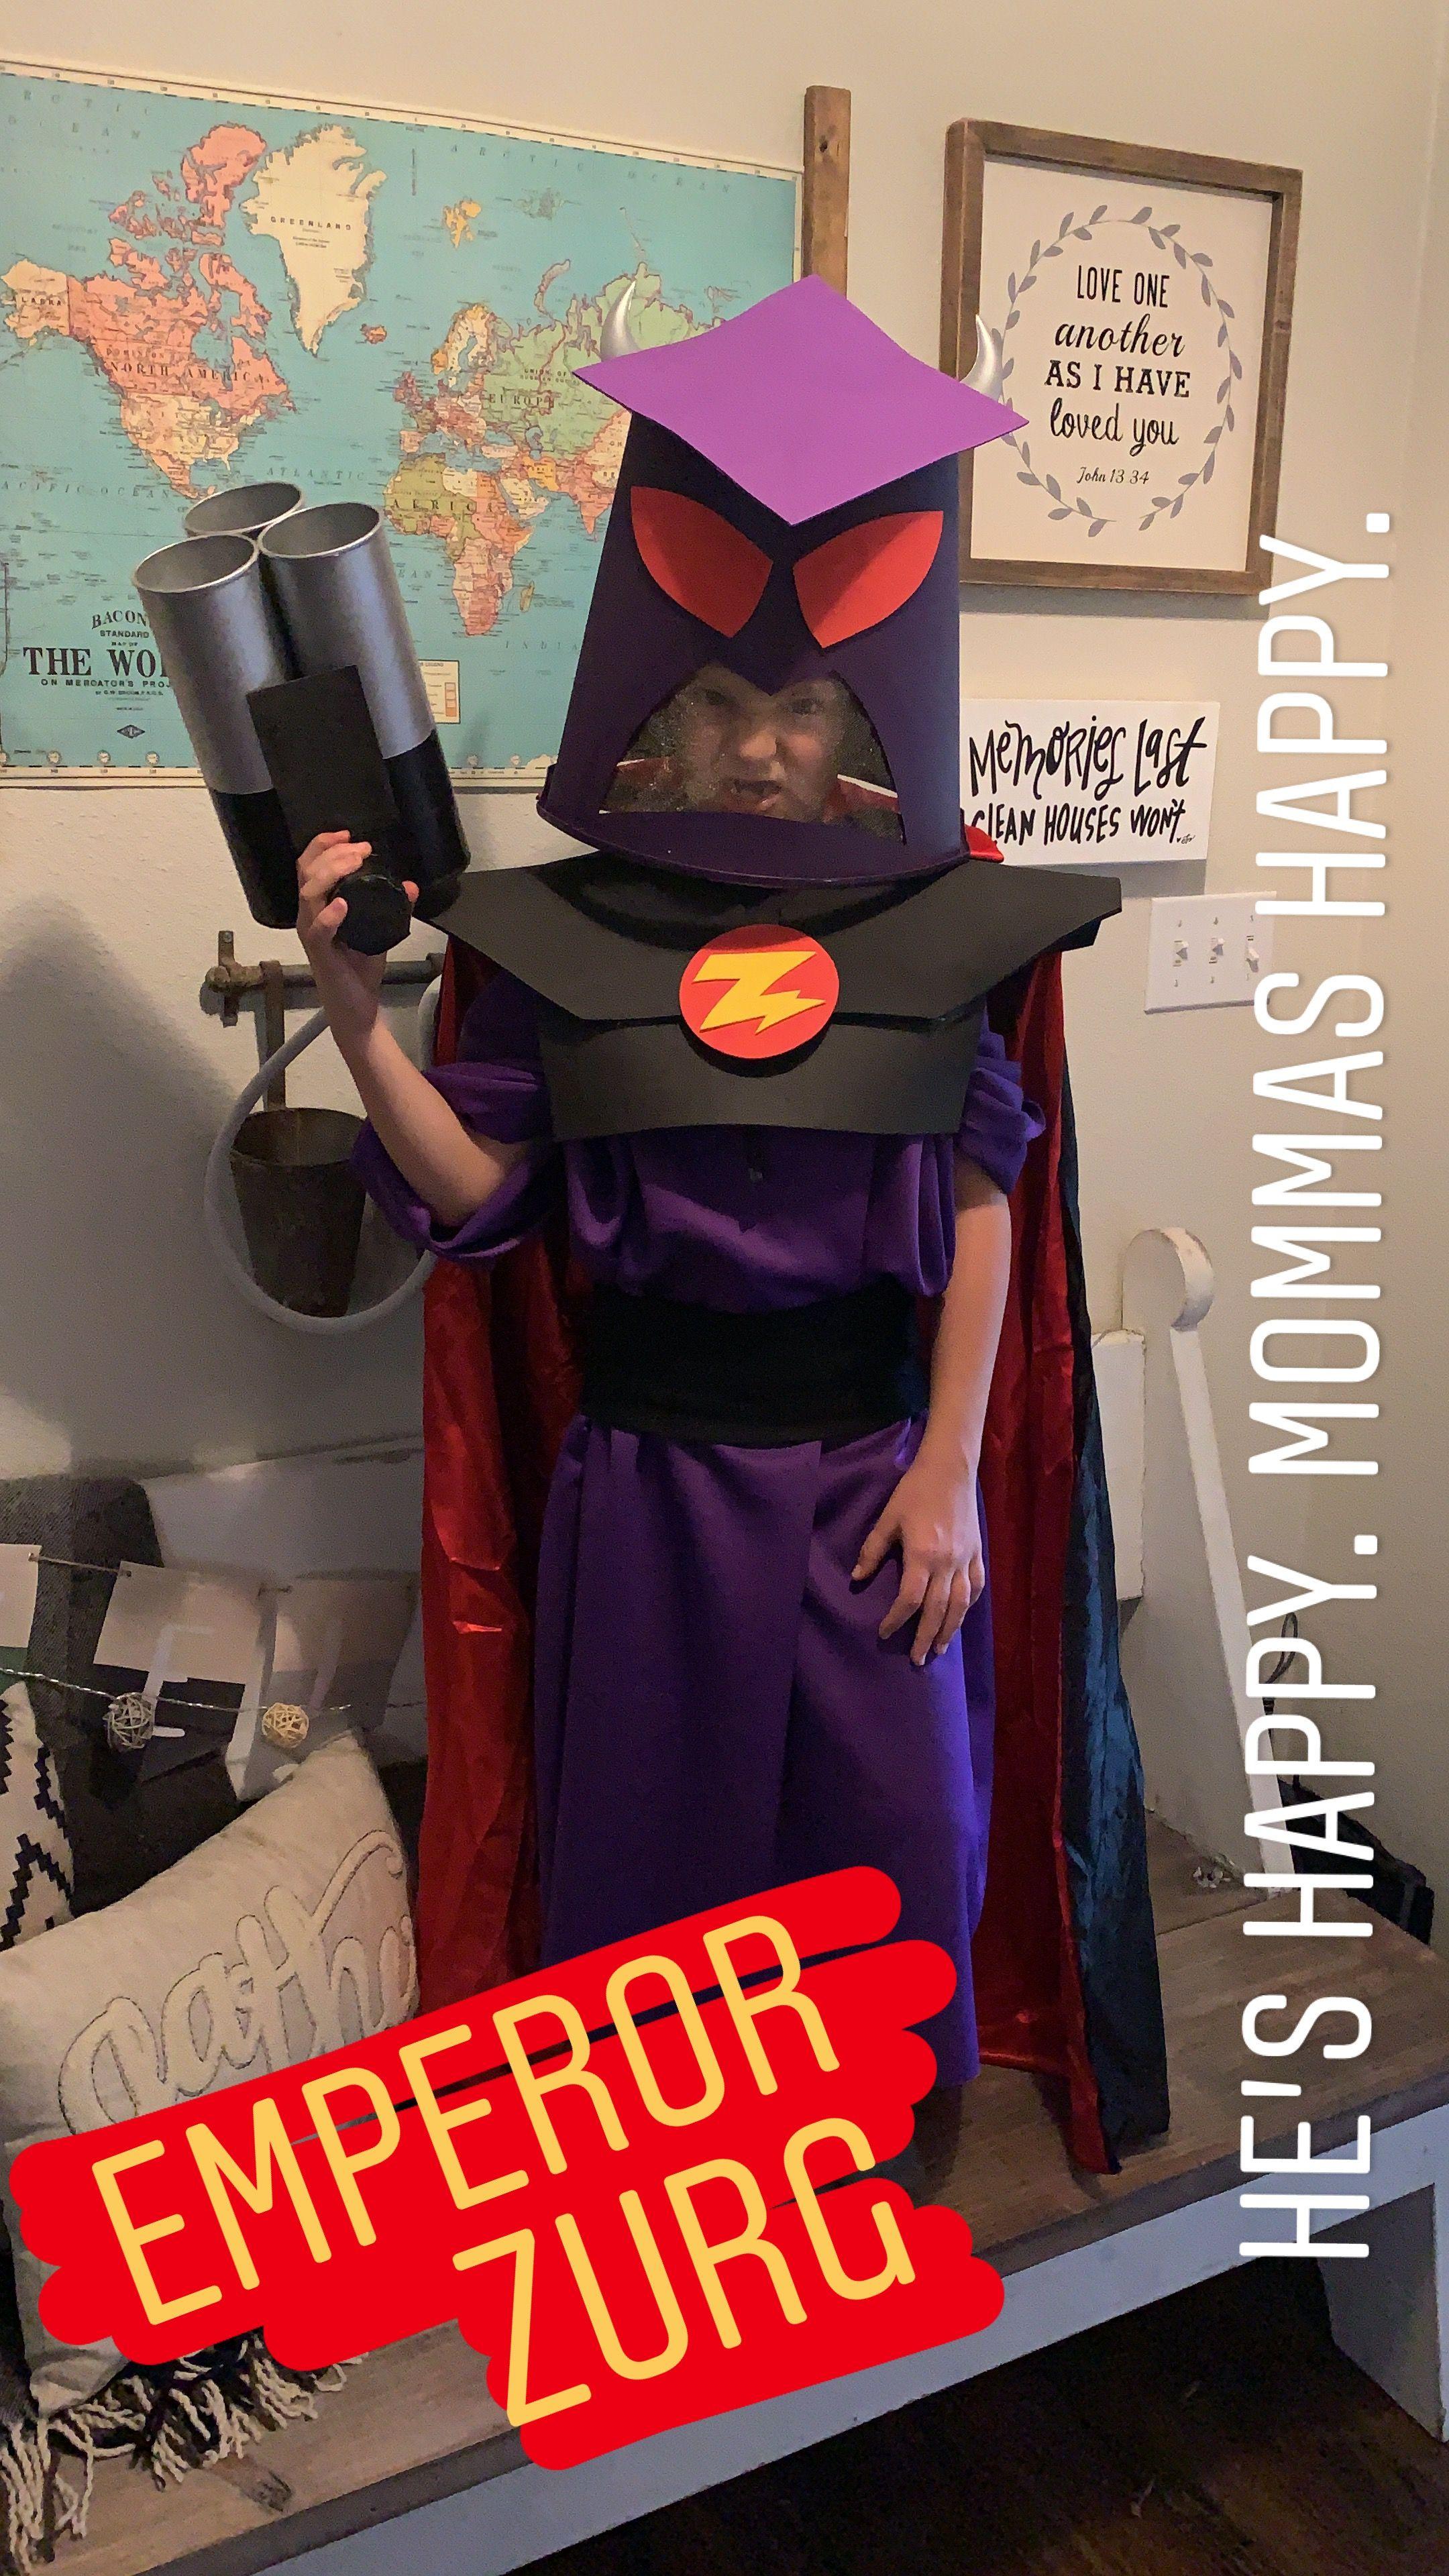 Toy Story 4 Halloween Costumes.Emperorzurg Toystory Toystory4 Diycostume Halloweenie In 2019